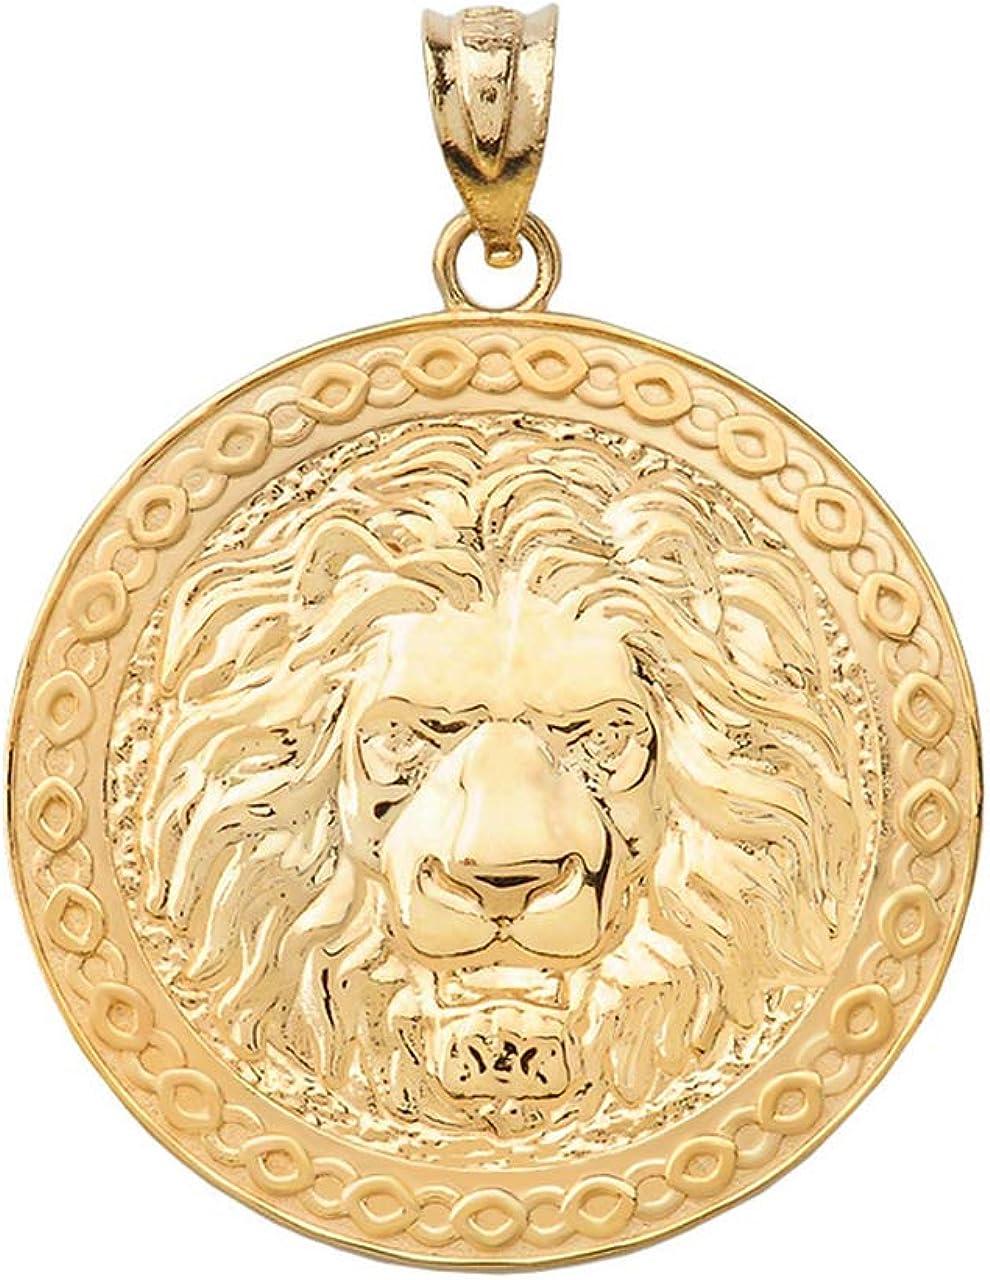 Certified 10k Gold Lion Head Medallion Round Pendant Charm Necklace